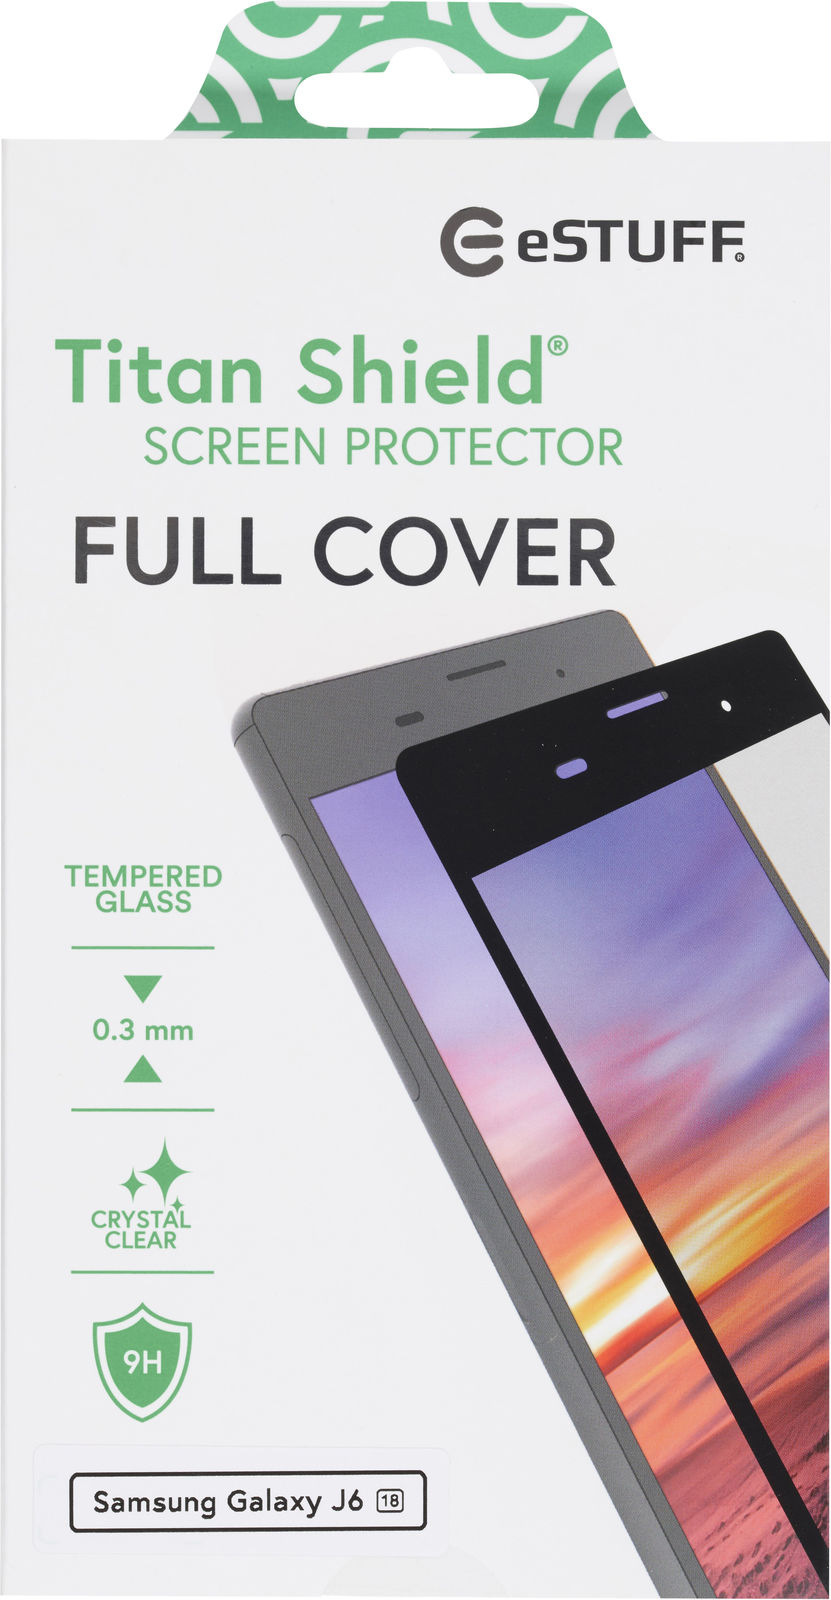 ESTUFF Samsung Galaxy J6 (18) Full Bl Titan Shield Screen Protector ES504027 - eet01